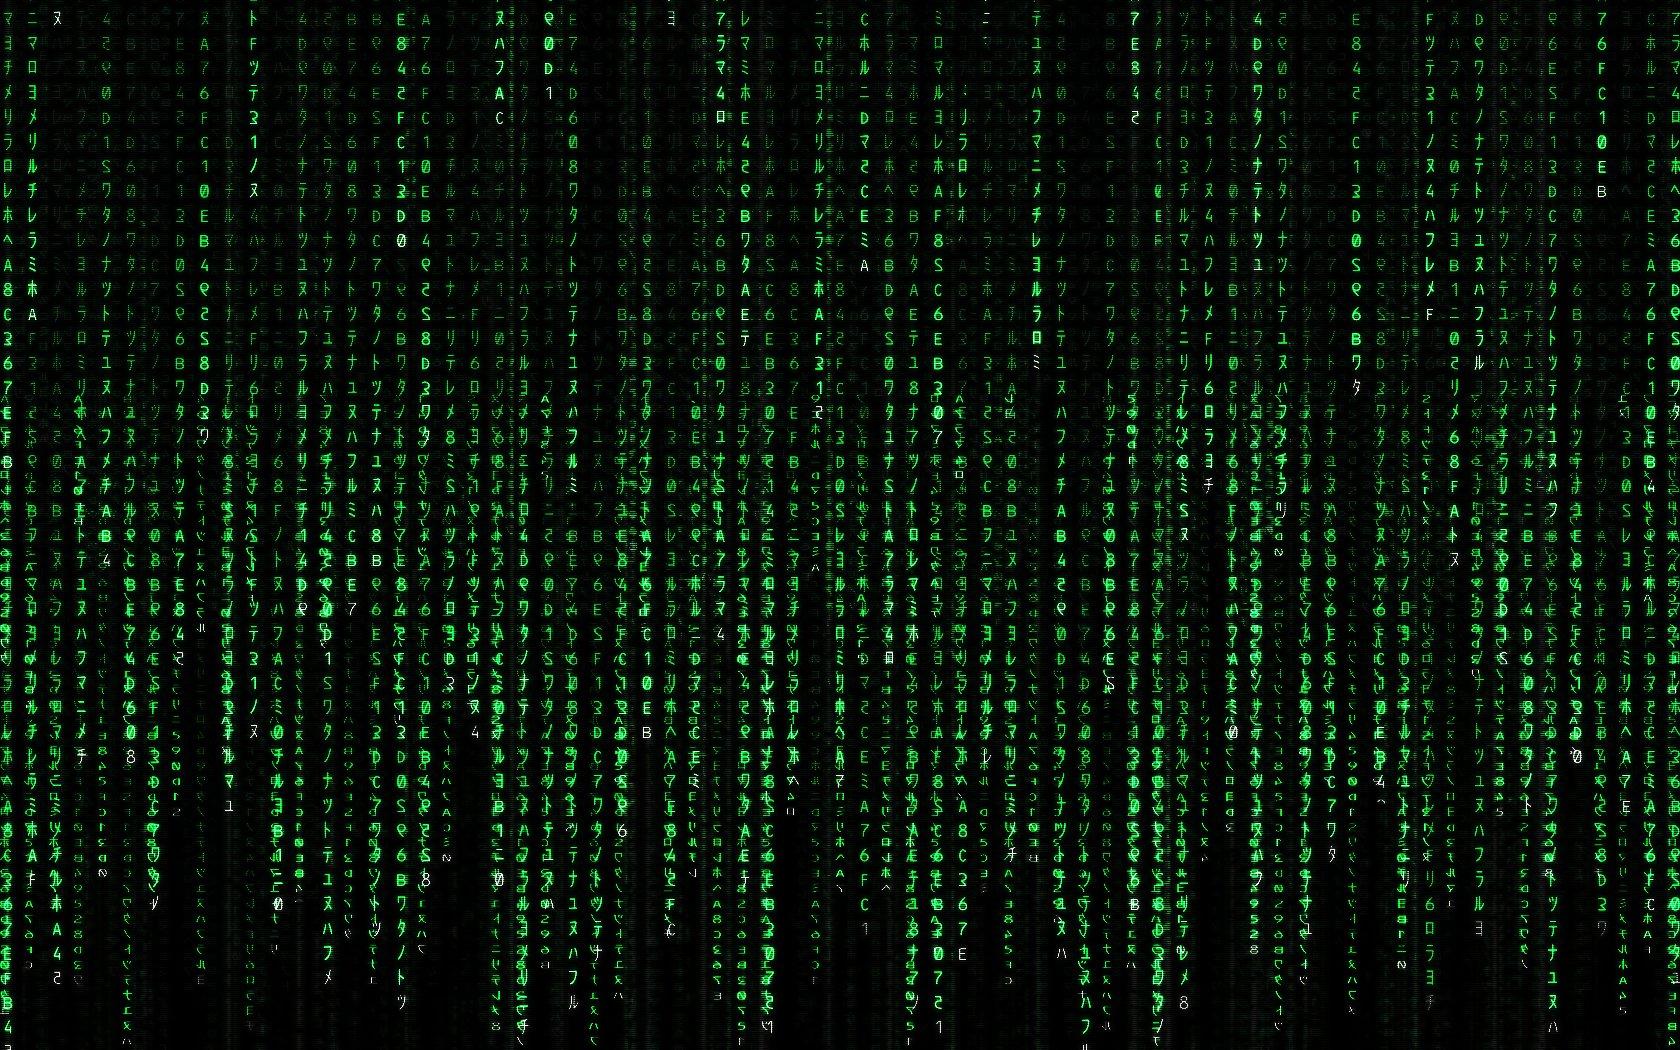 Matrix Falling Code Wallpaper Green Falling Down Matrix Wallpaper 1680x1050 242075